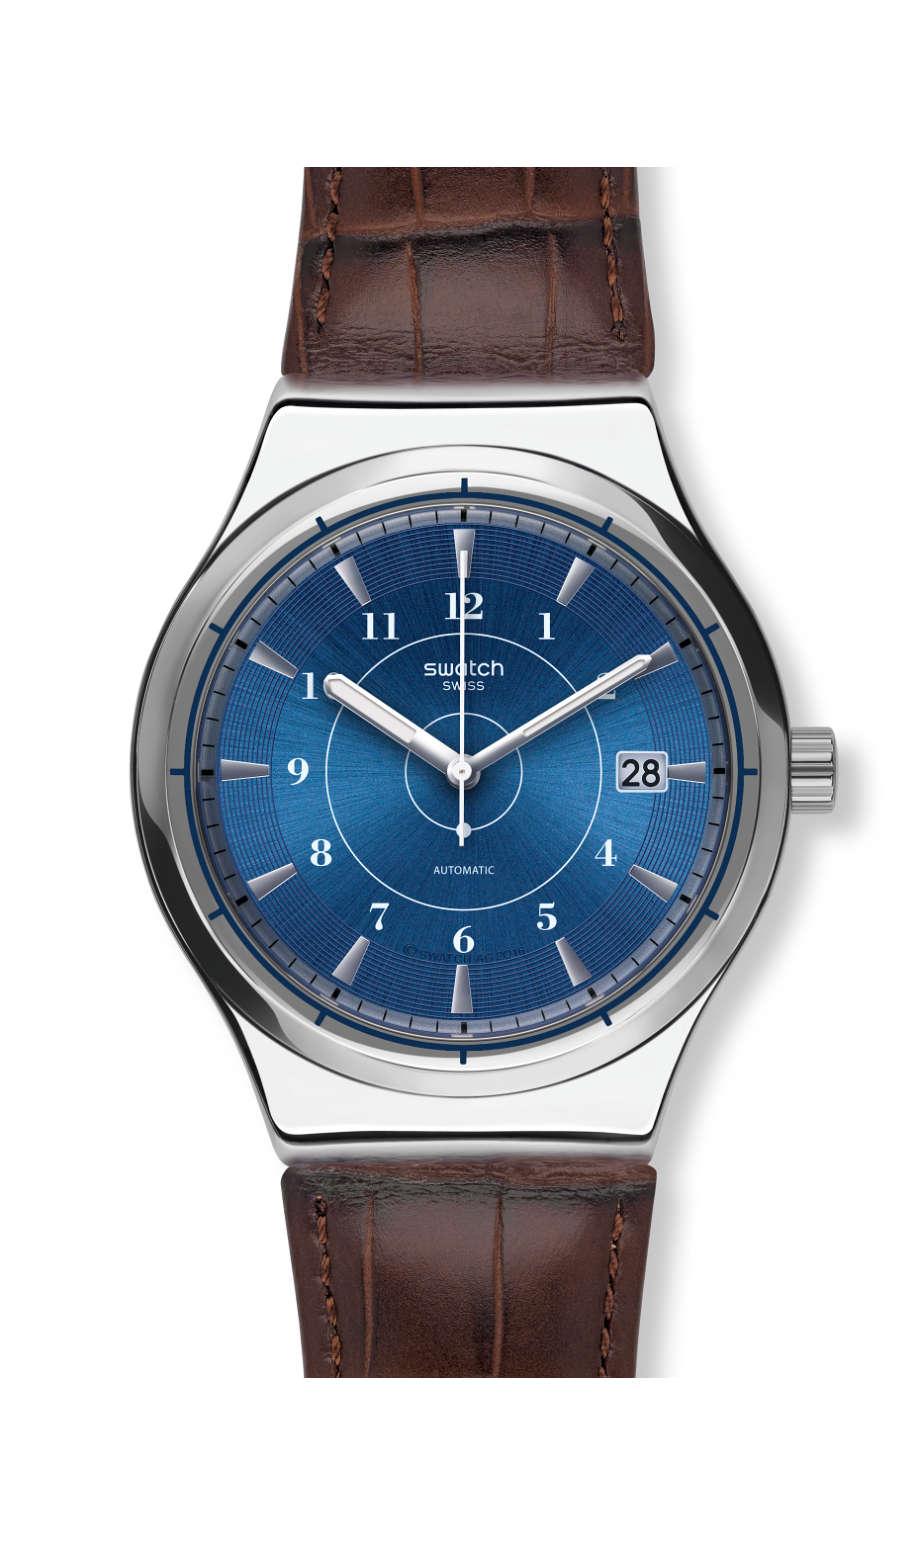 Swatch - SISTEM FLY - 1